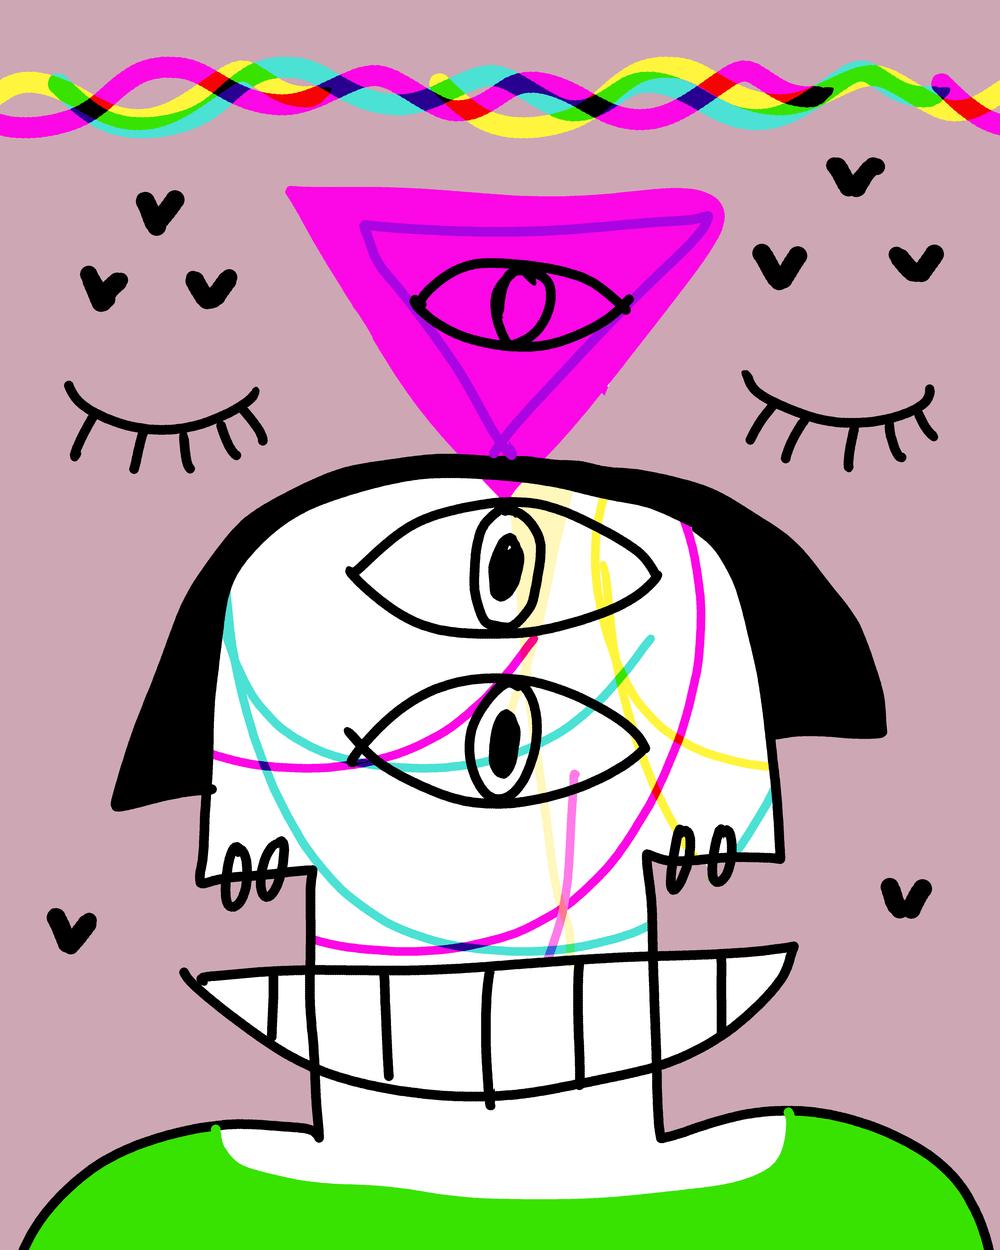 glitch-art-illustration_portrait-drawing